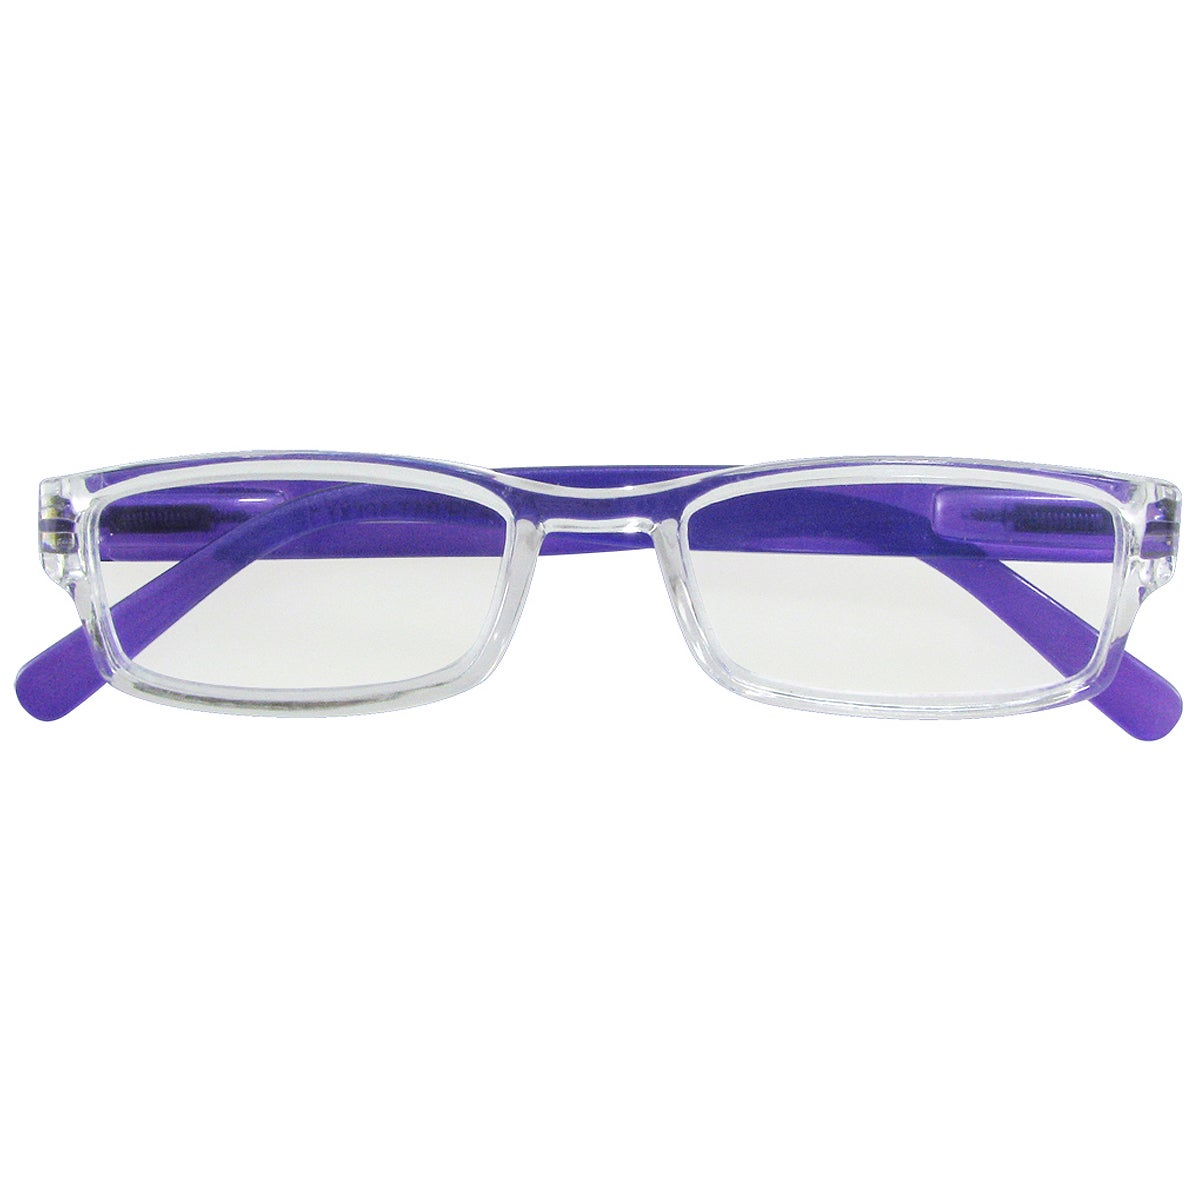 E-specs by Evolutioneyes Purple Computer Glasses